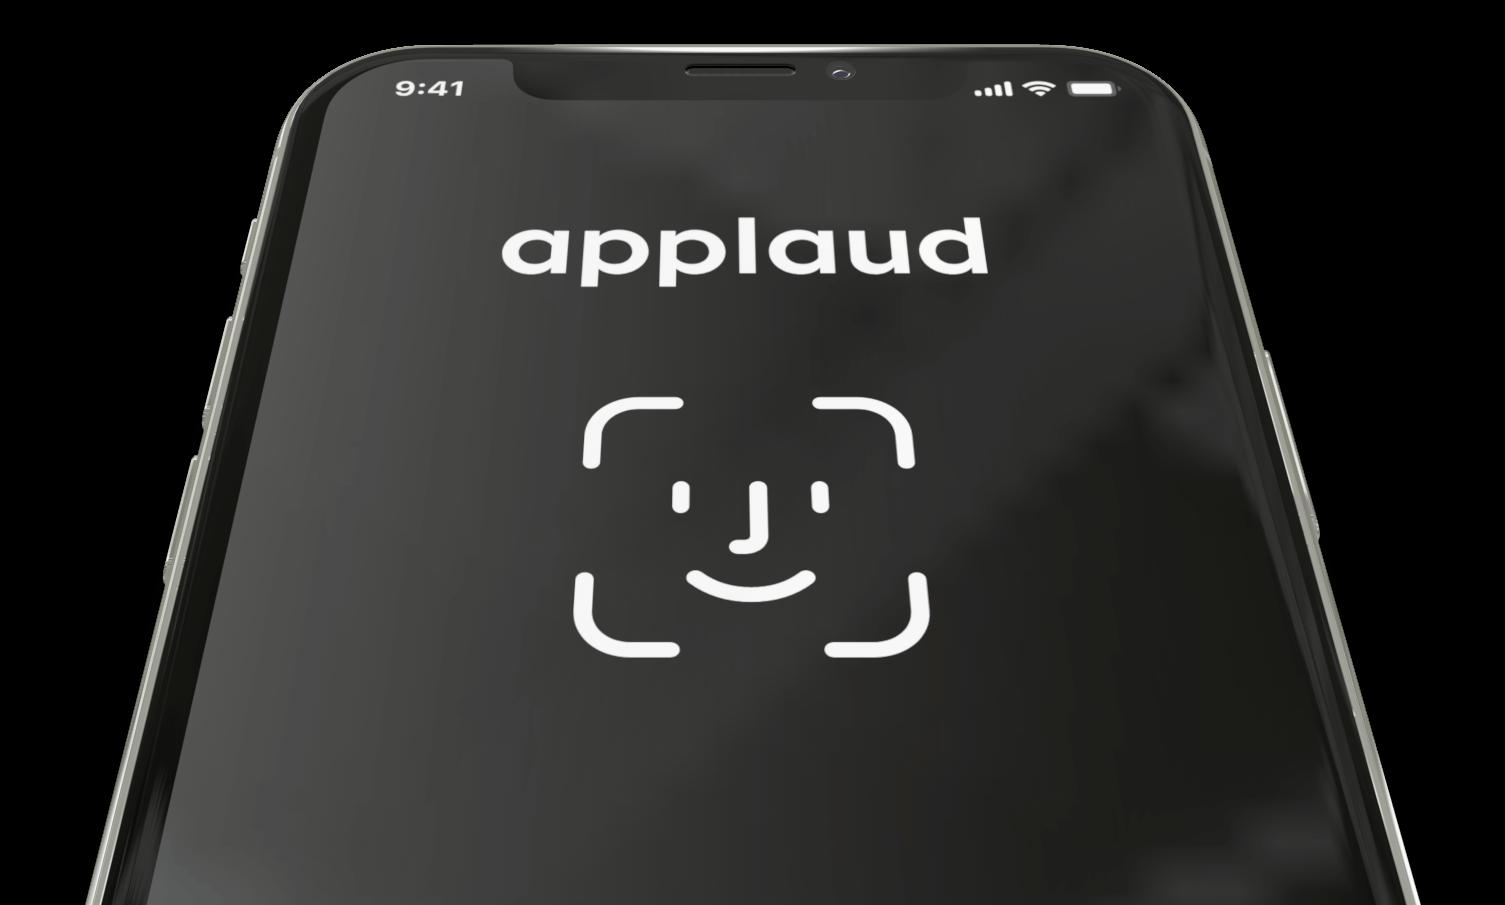 Applaud Face_ID